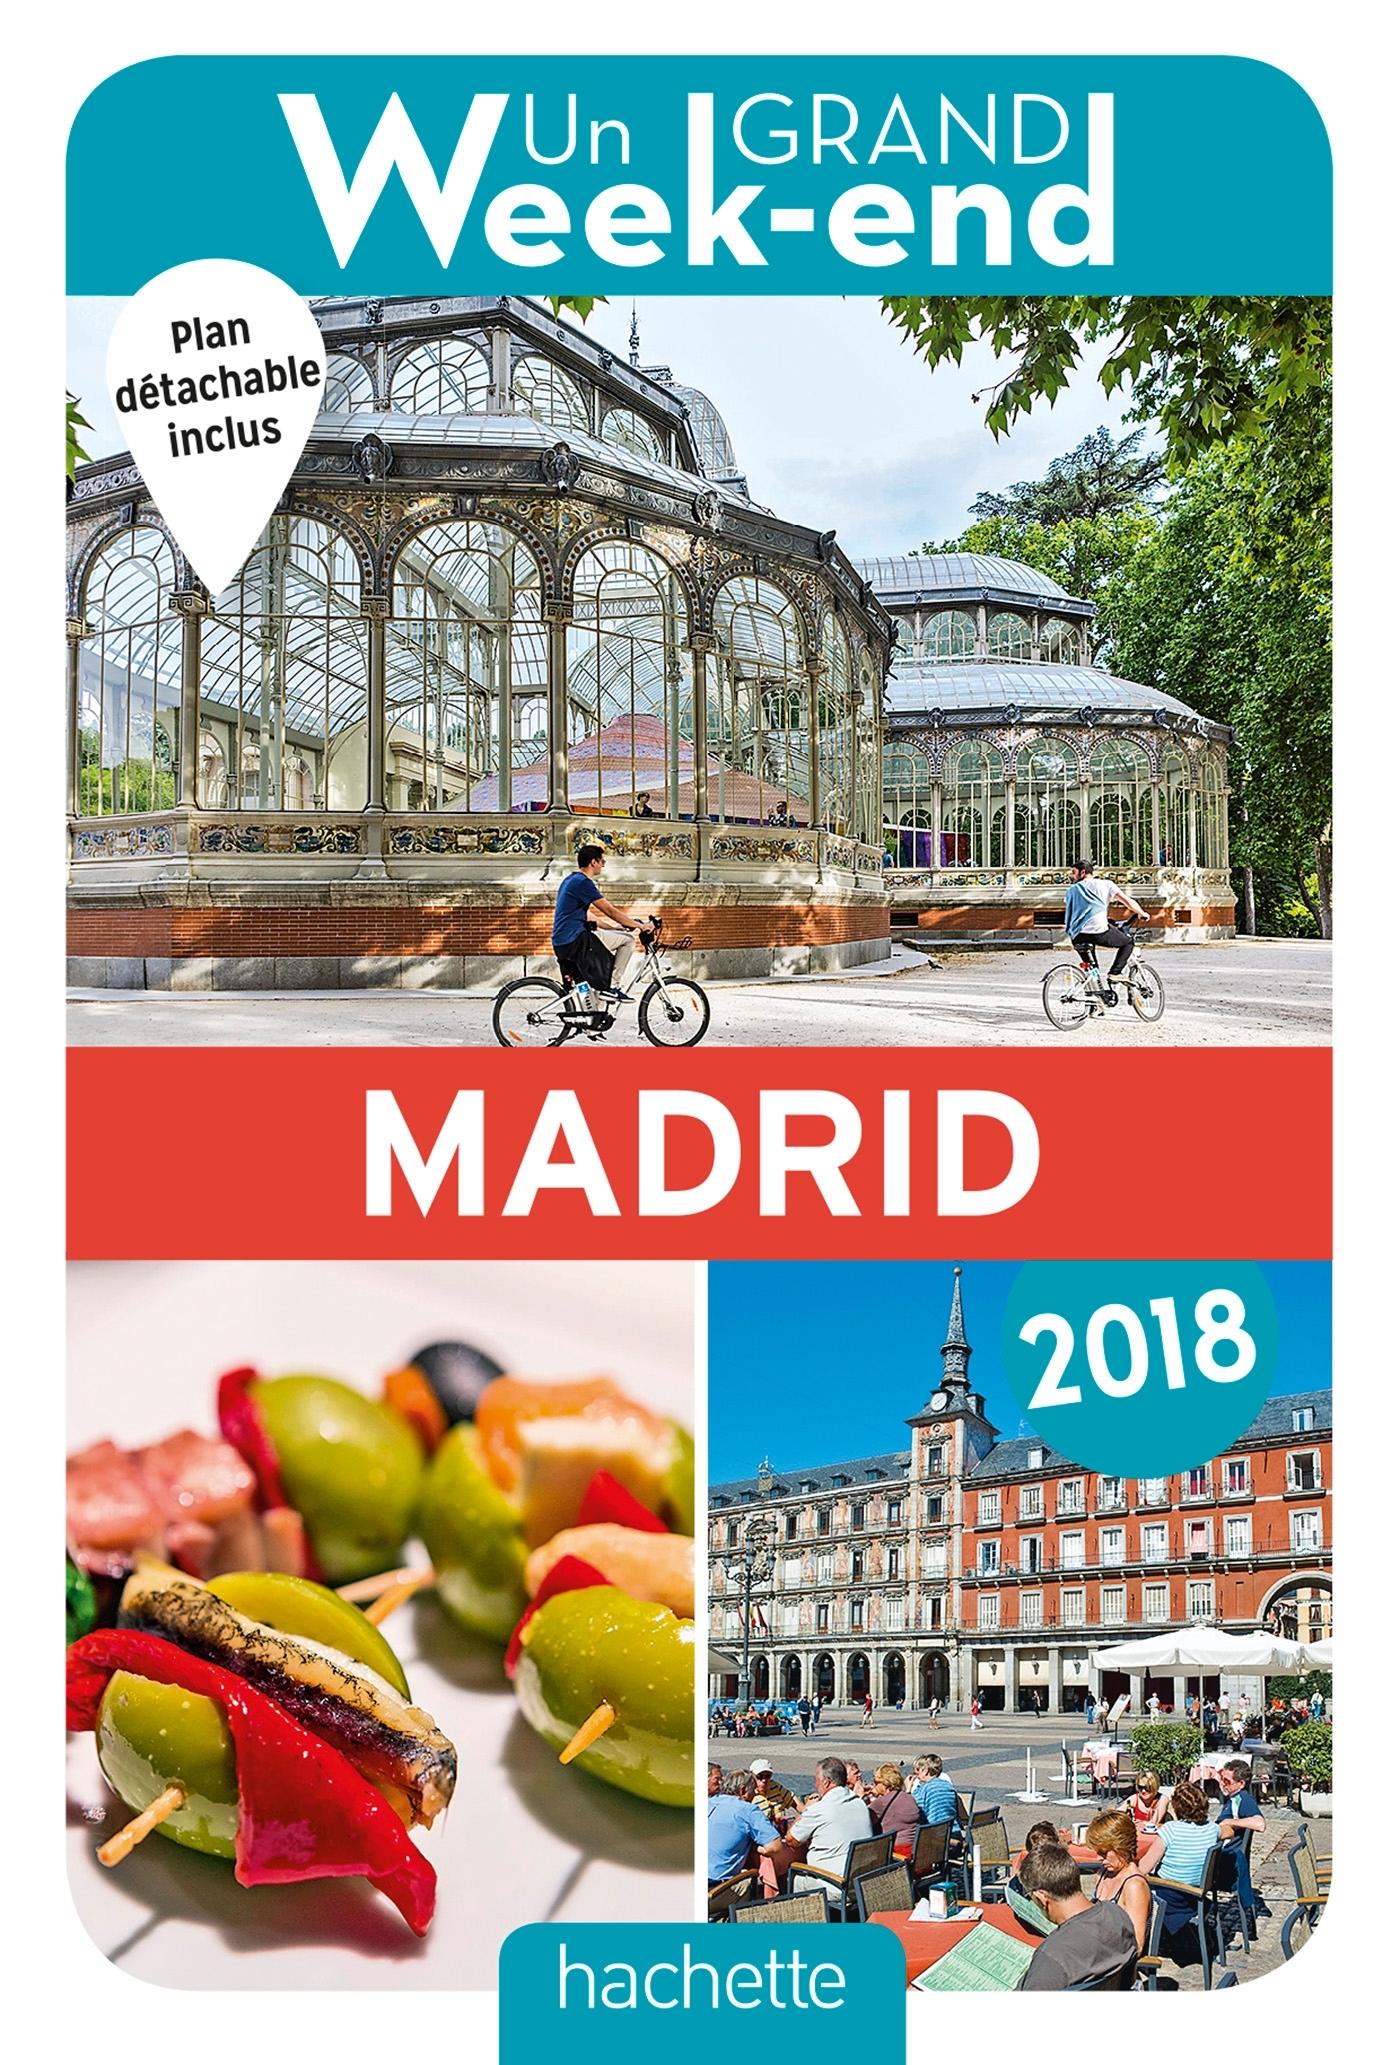 UN GRAND WEEK-END A MADRID 2018